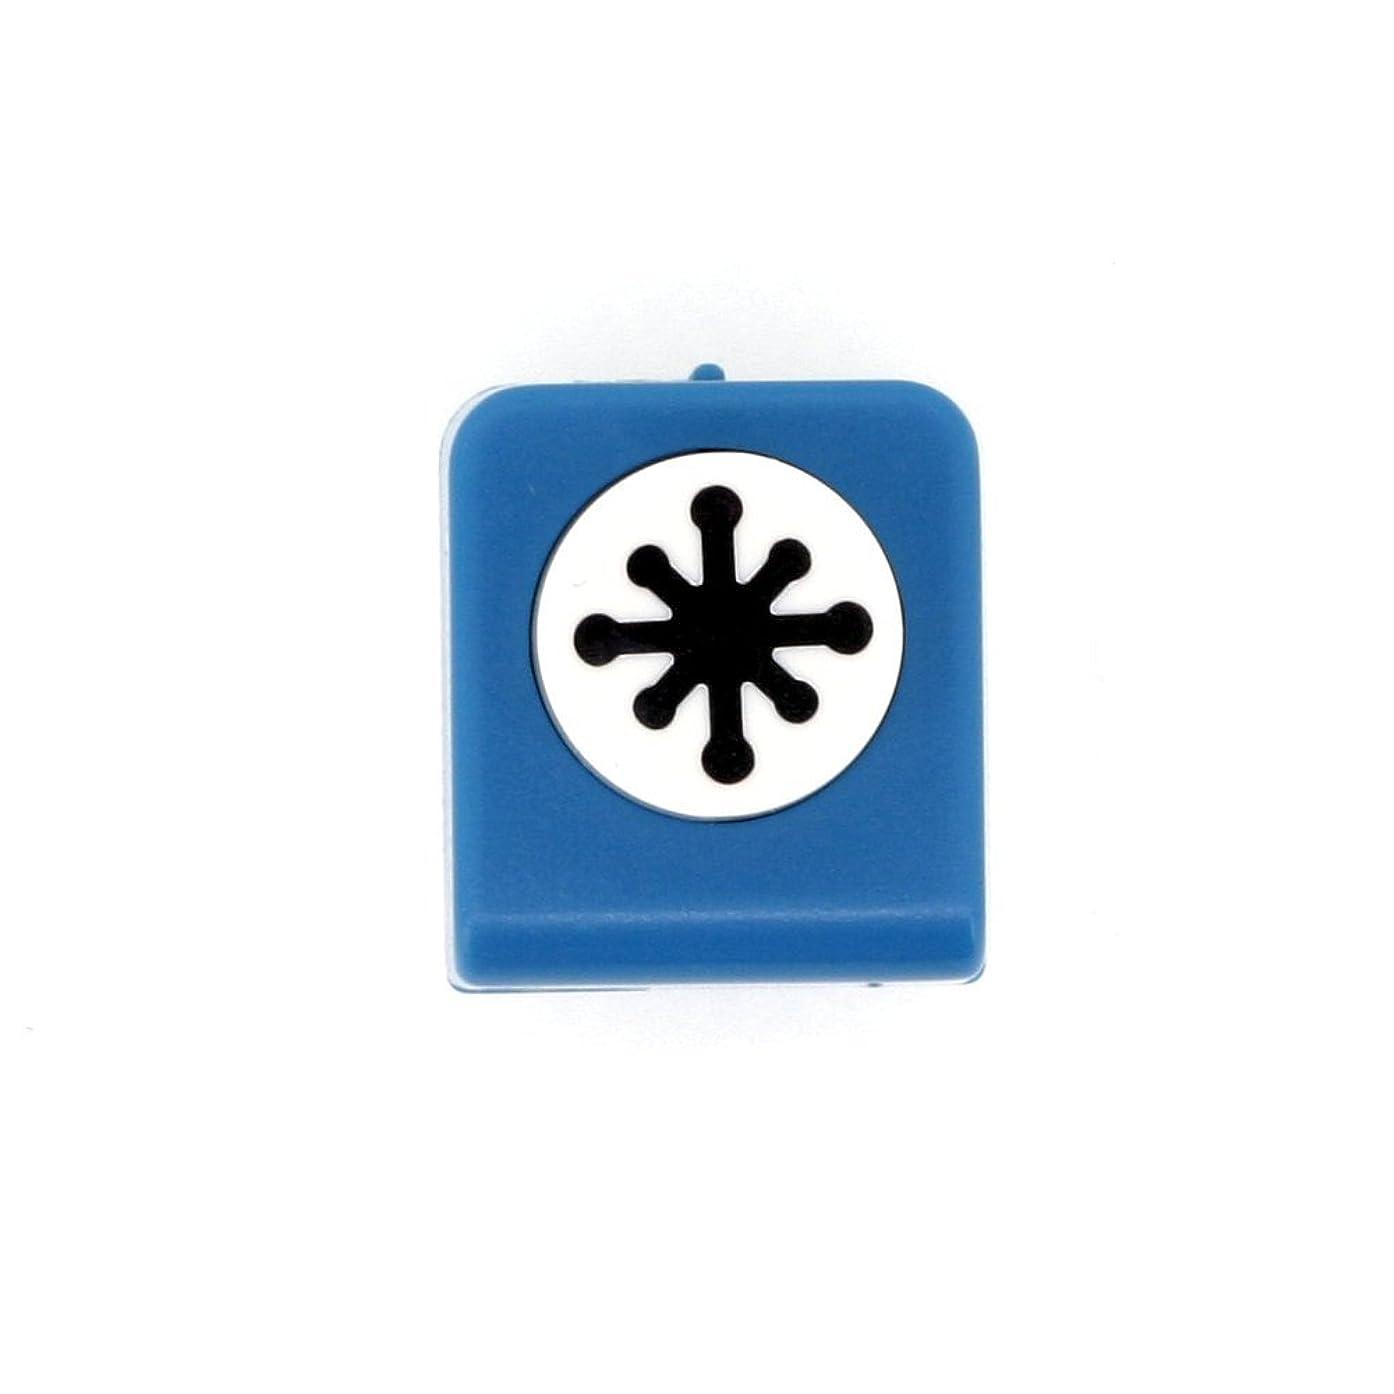 Carl Craft Mini Craft Paper Punch, Snow Flake (CN12120)